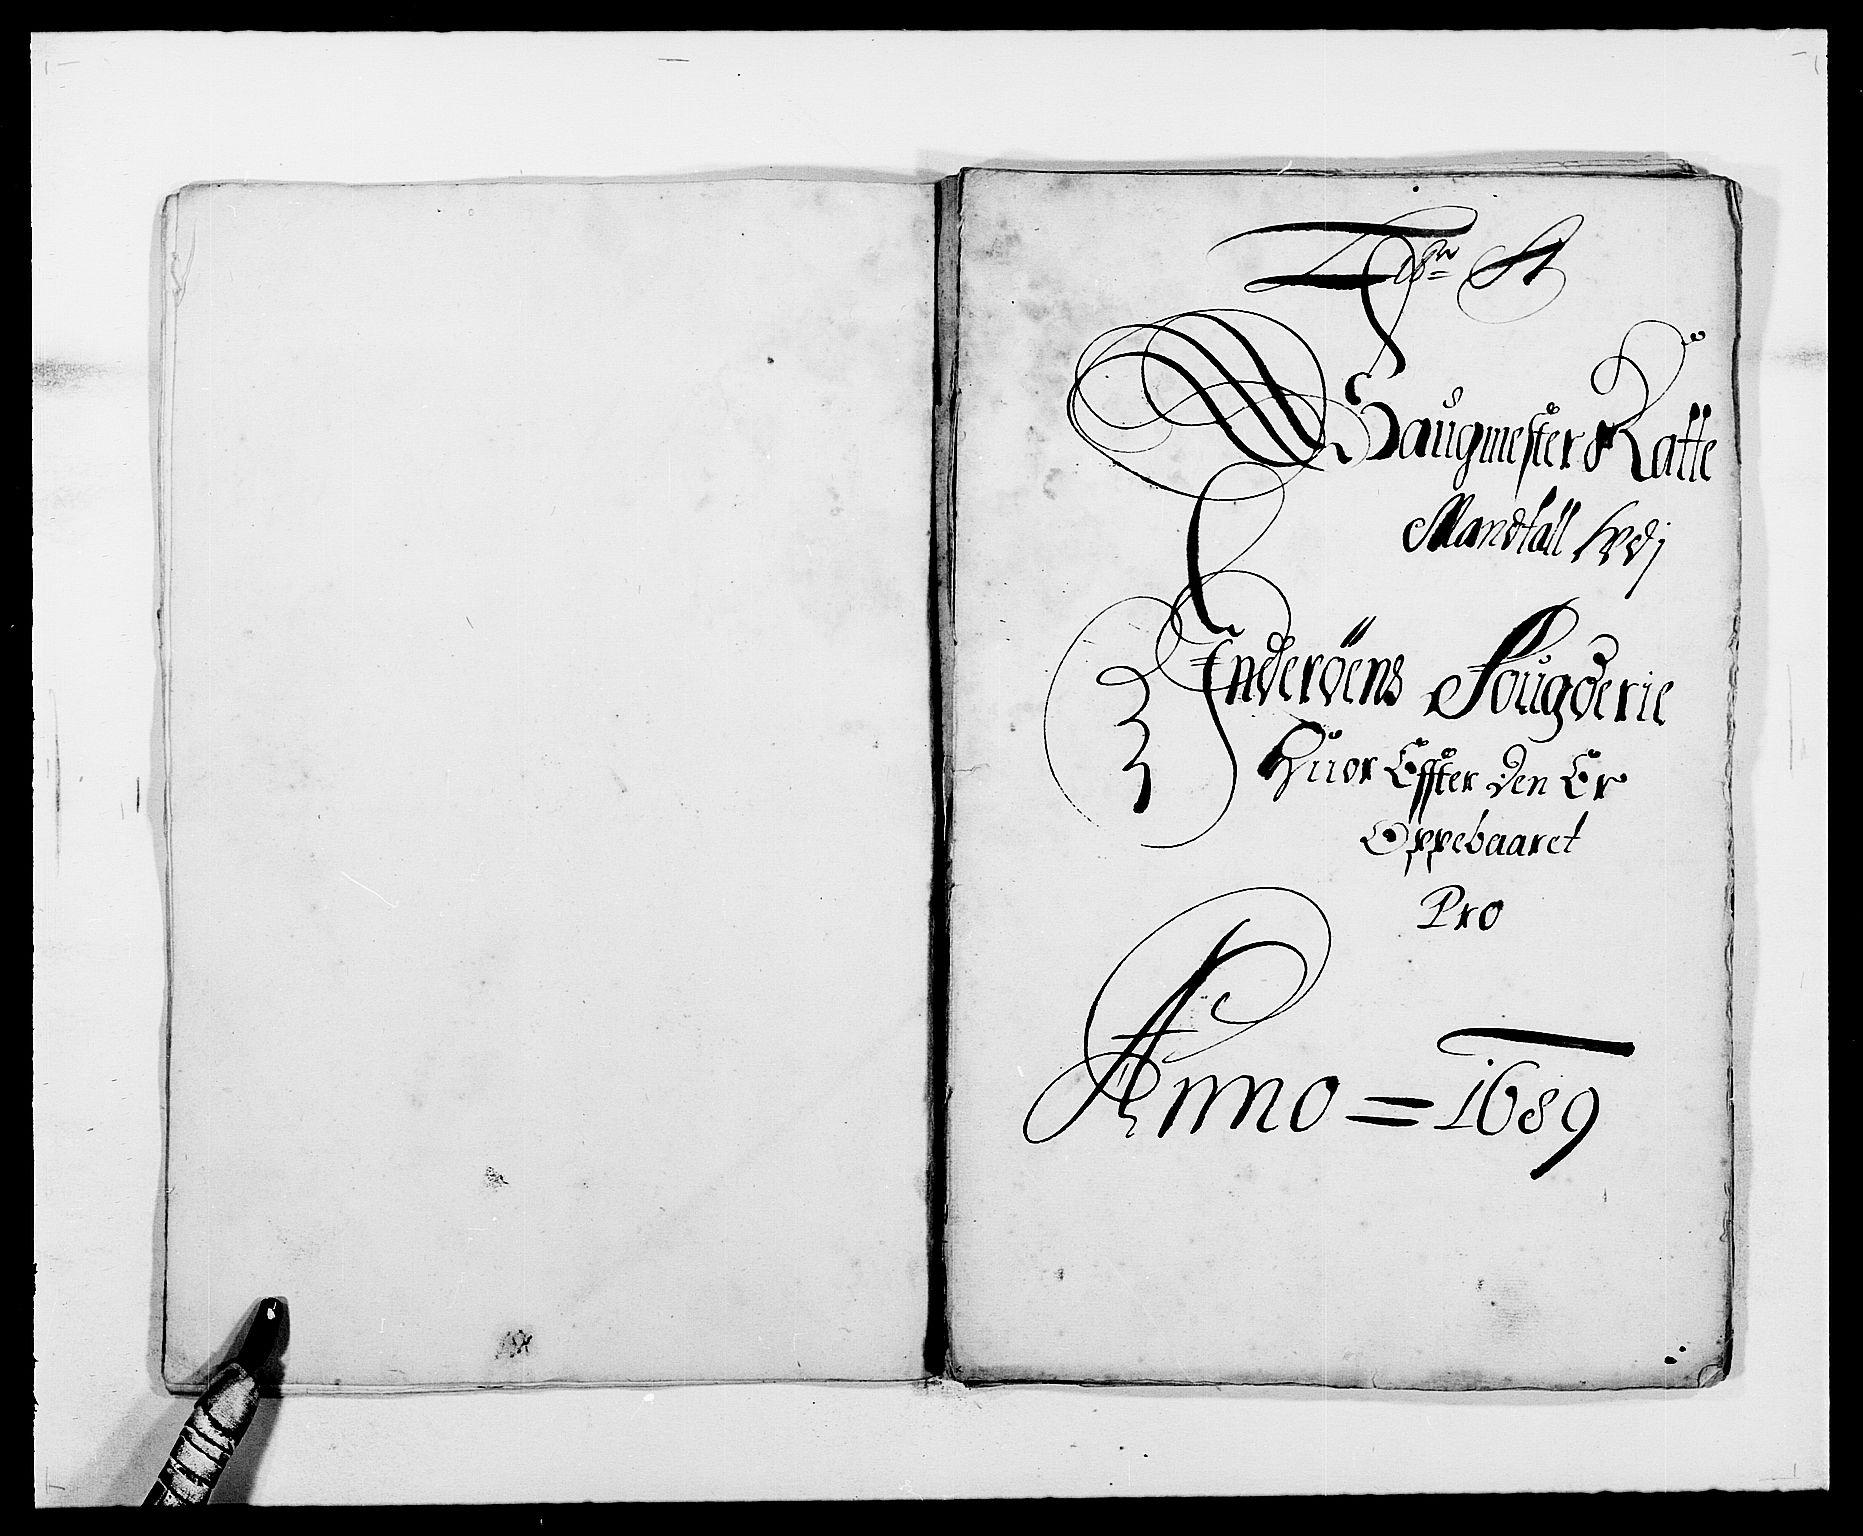 RA, Rentekammeret inntil 1814, Reviderte regnskaper, Fogderegnskap, R63/L4306: Fogderegnskap Inderøy, 1687-1689, s. 395